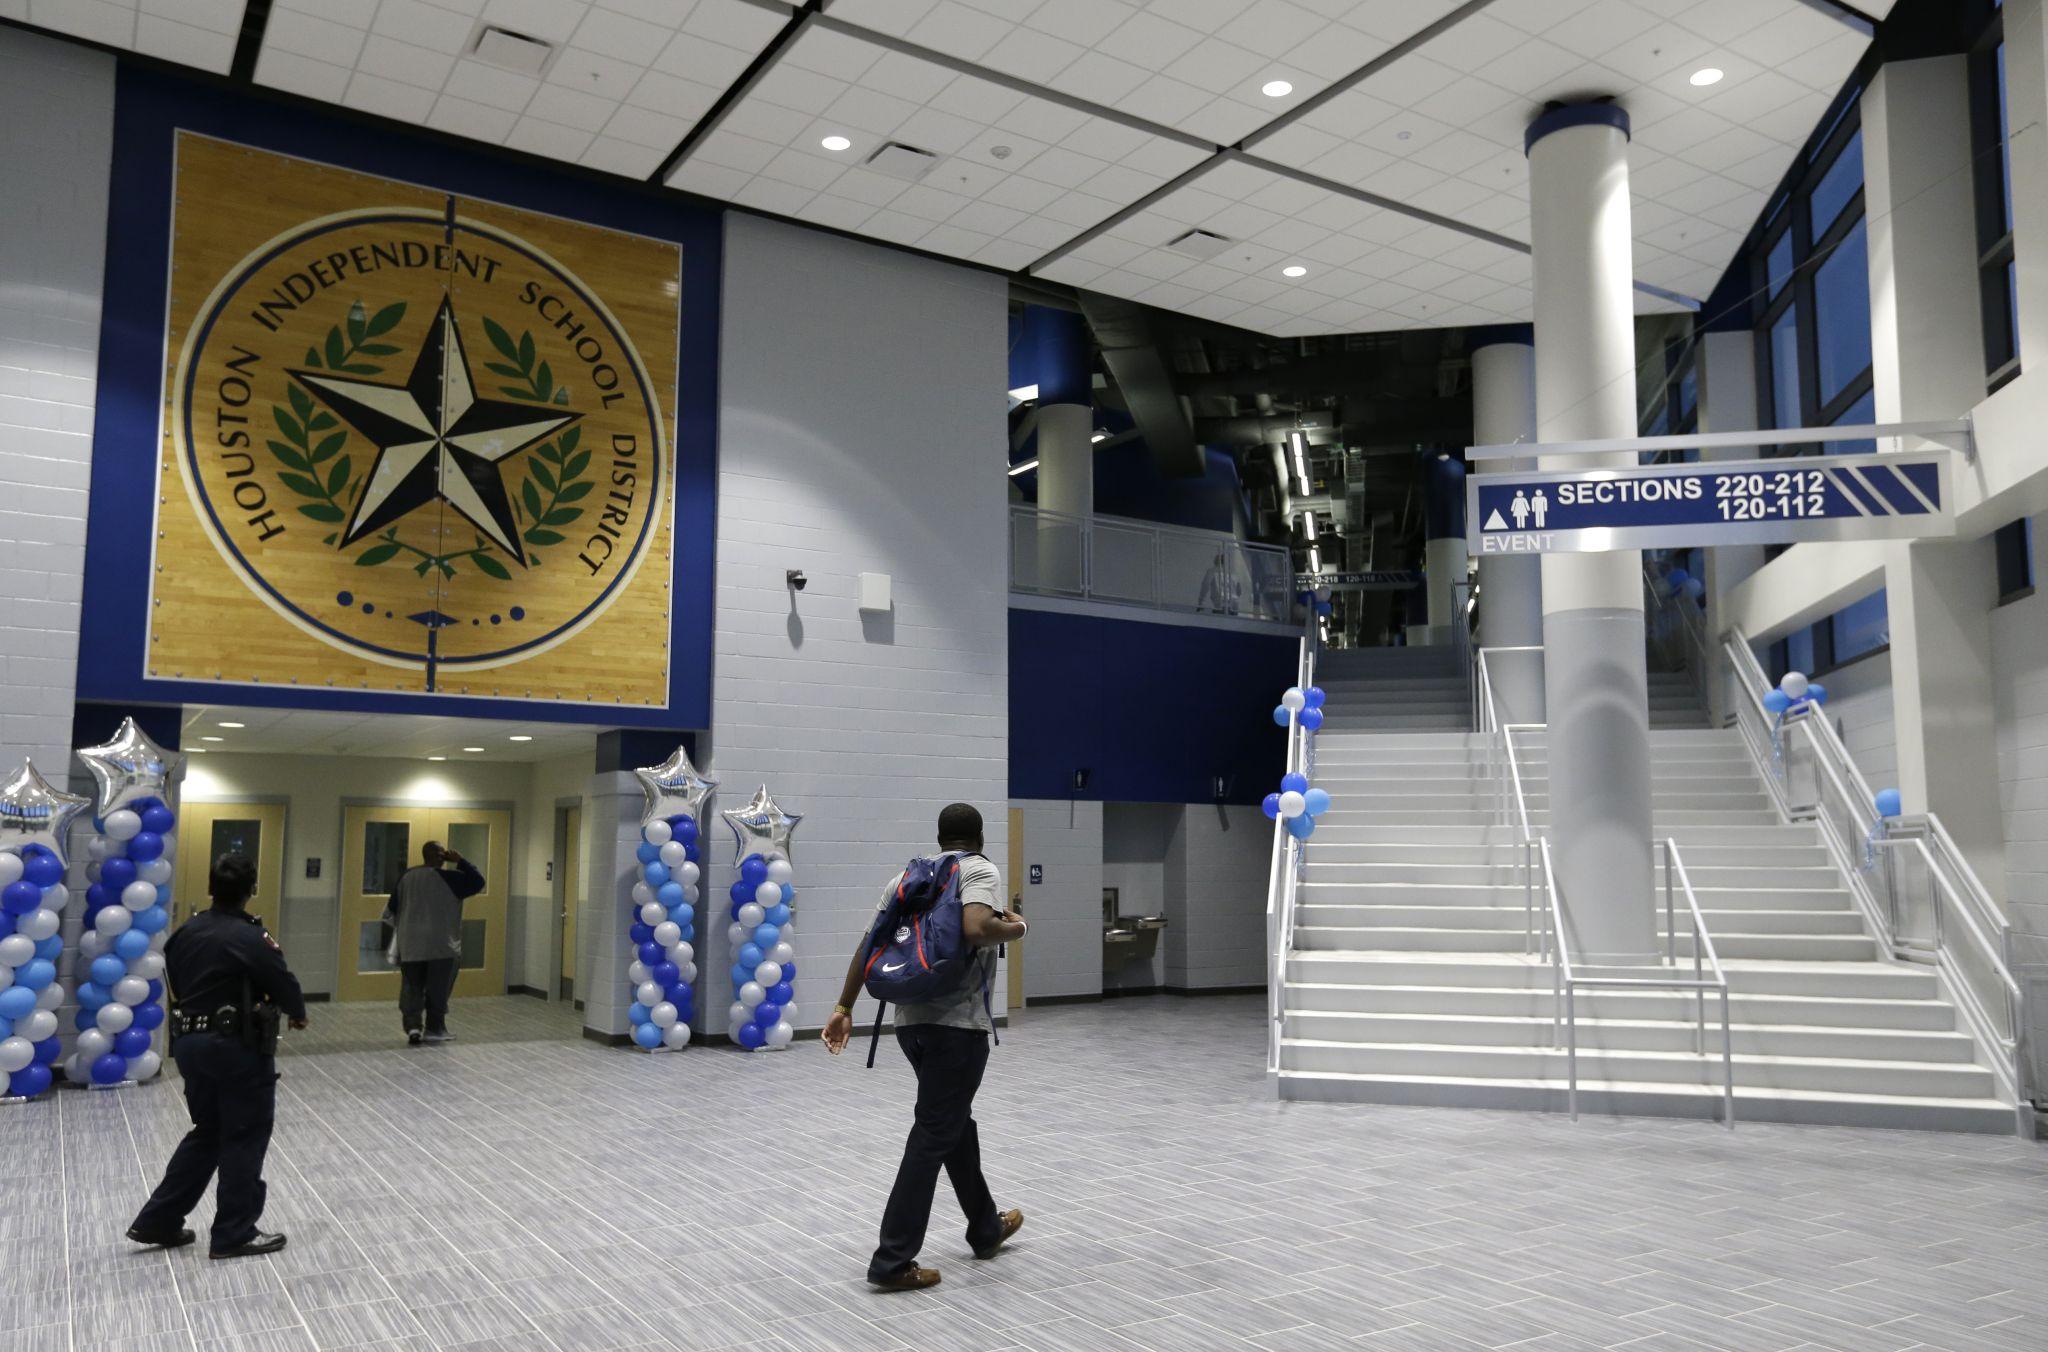 Flossy Houston Isd Unveils Million Delmar Fieldhouse Houston Chronicle Yates Field House Parking Yates Field House Staff curbed Yates Field House